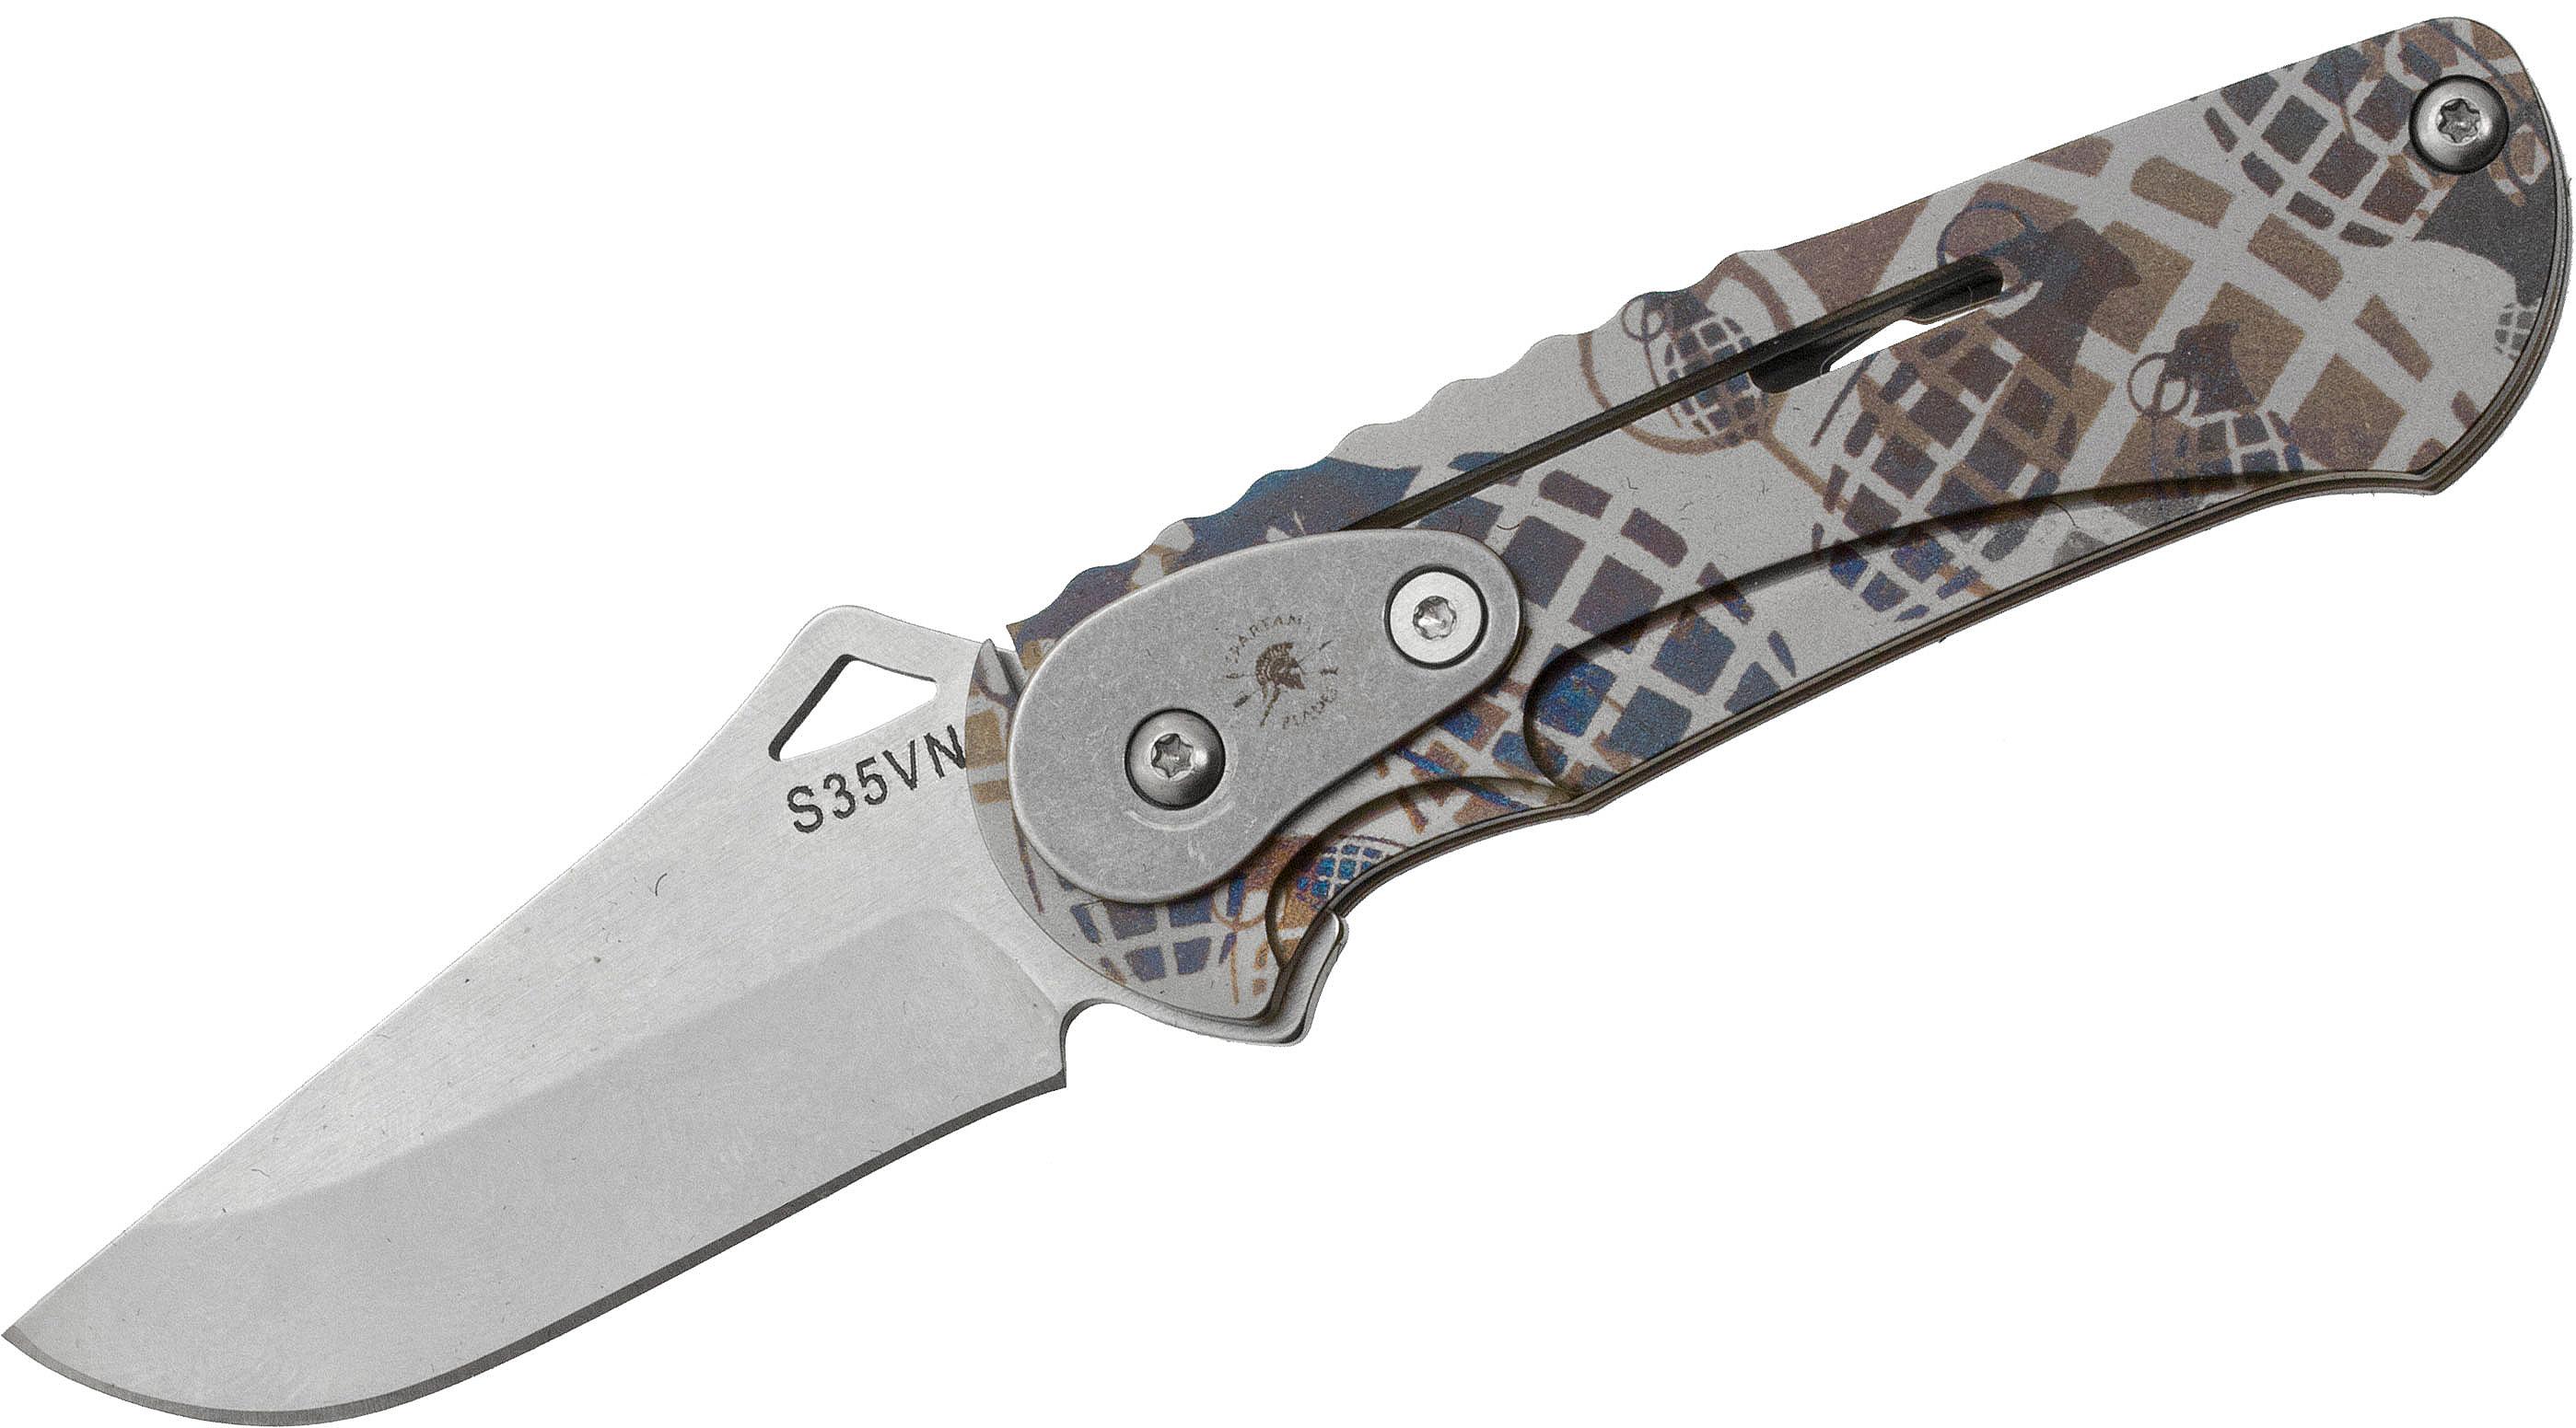 Spartan Blades Customized Nymph Integral Frame Mini Slipjoint Folder 1-7/8 inch S35VN Stonewash Blade, Grenade Titanium Handles